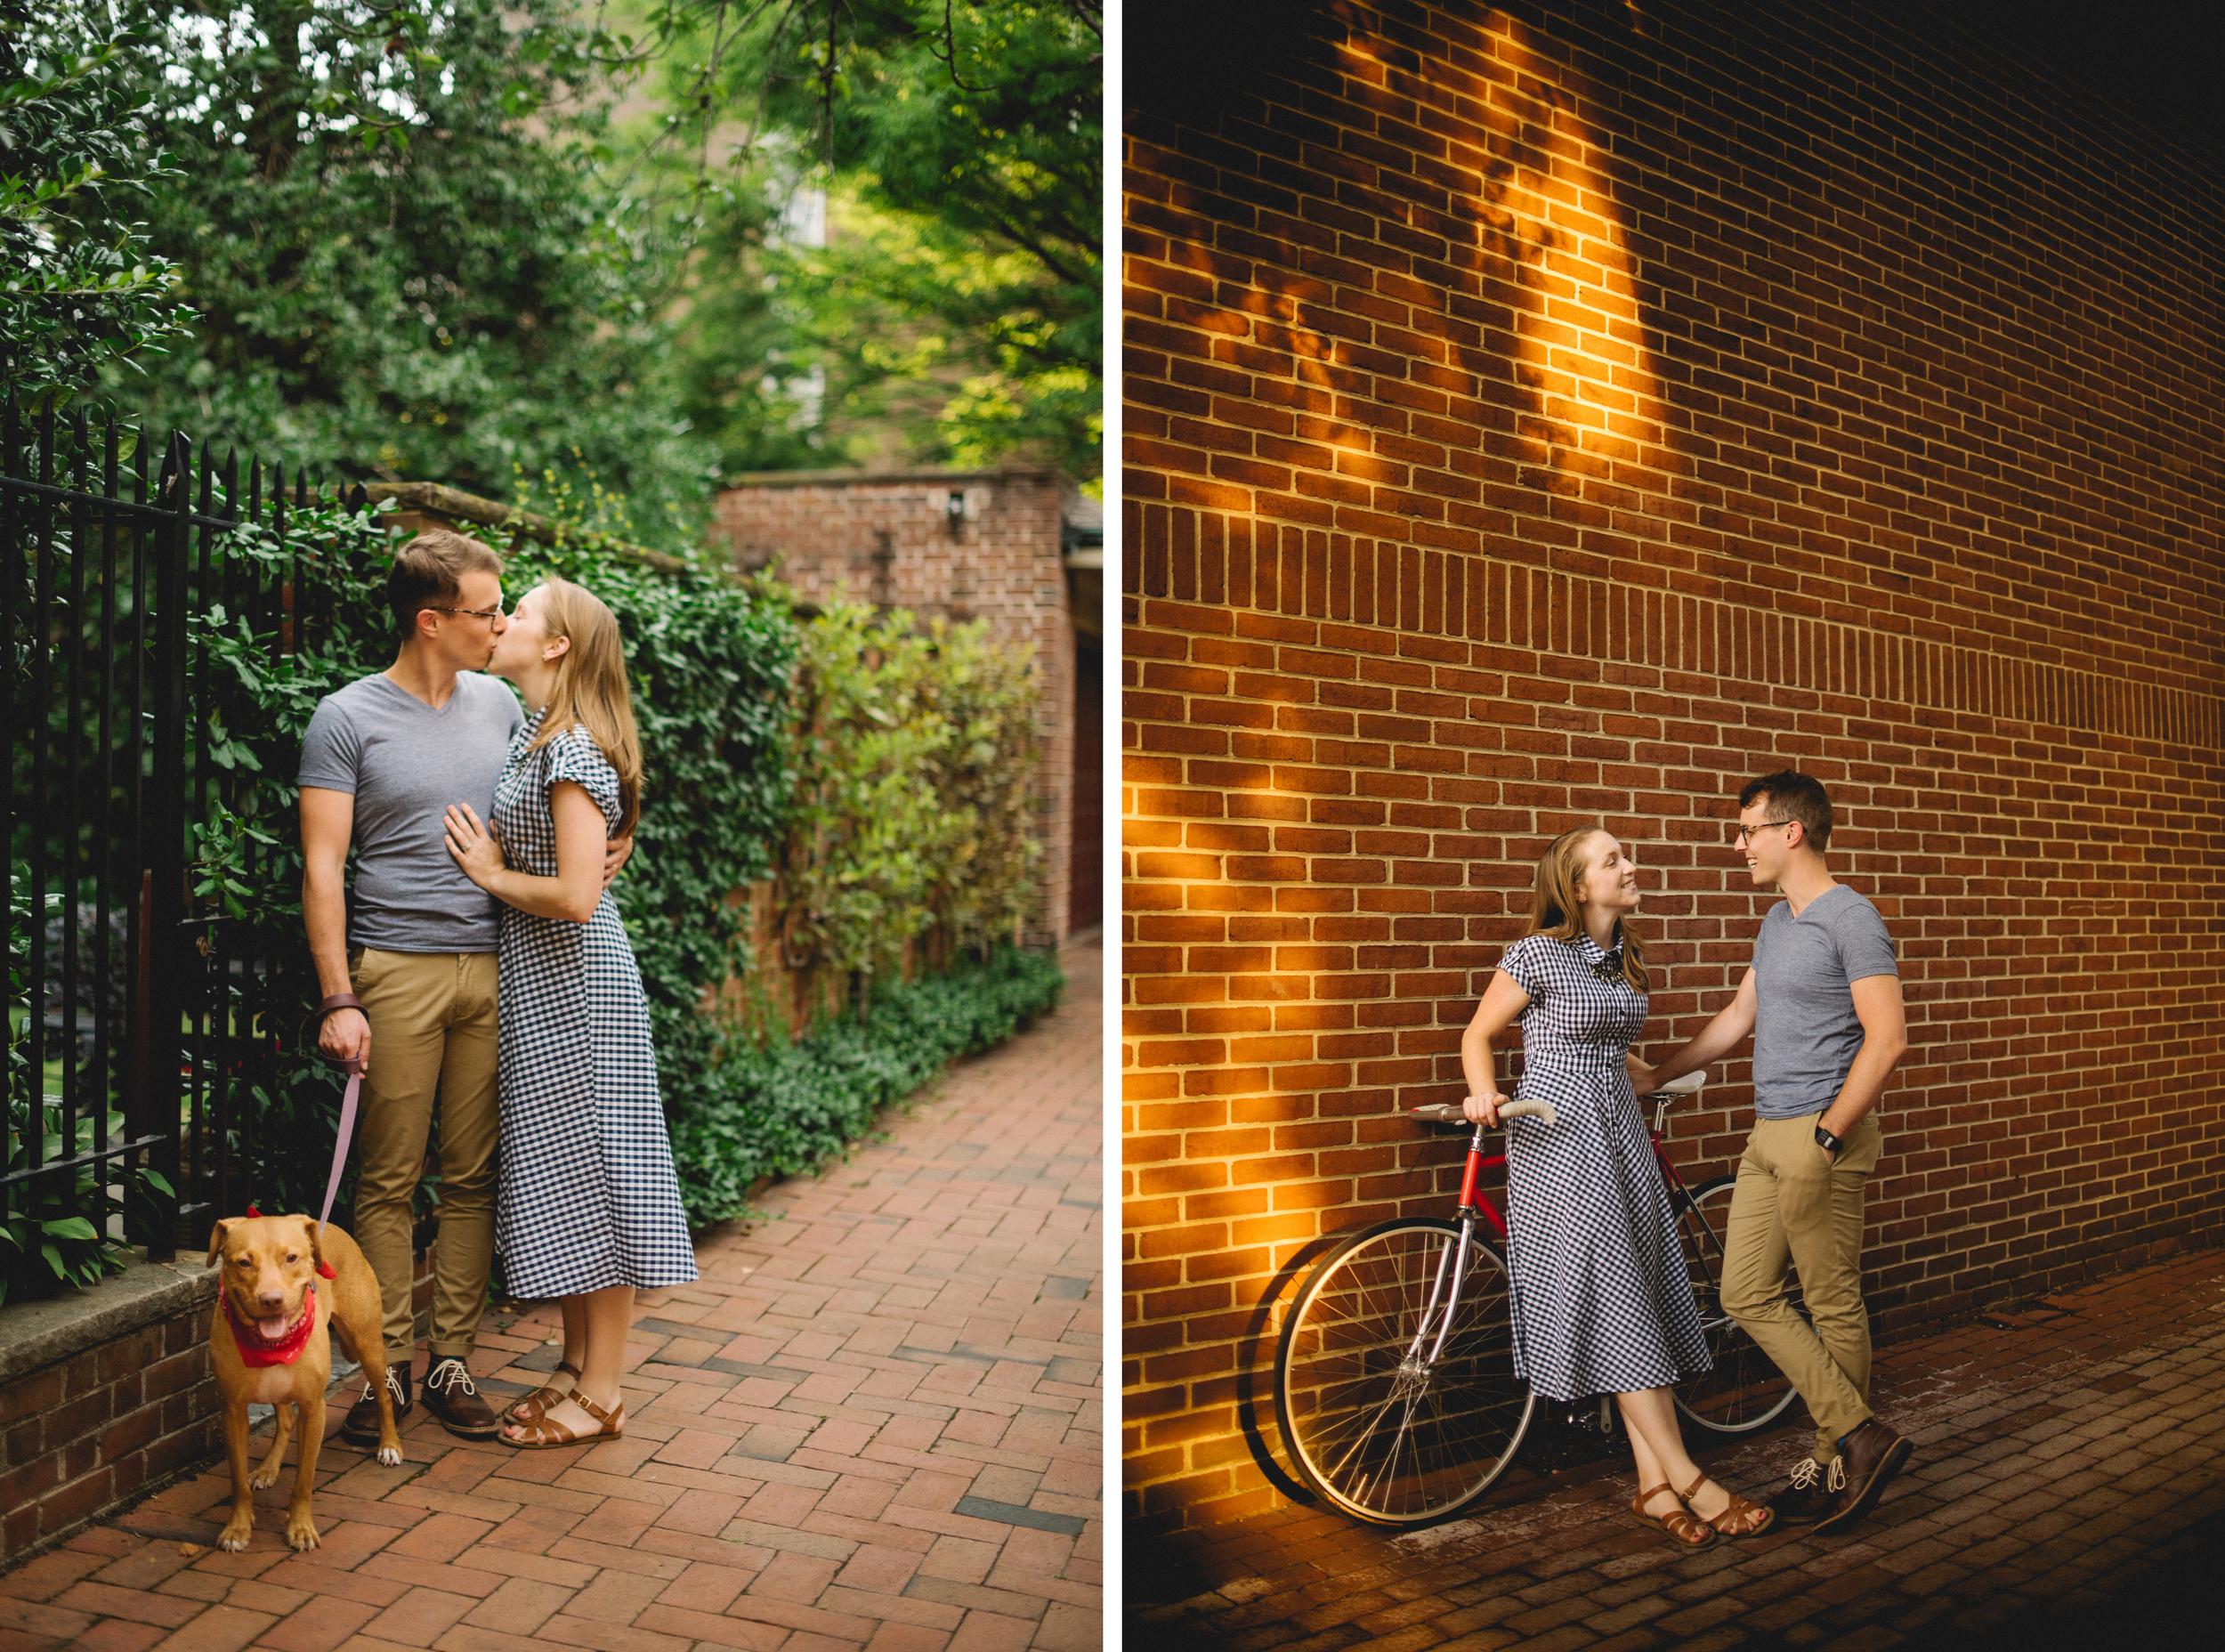 Peaberry-Photography-Society-Hill-Philadelphia-Pennsylvania-Newlyweds-Just-Married-037.jpg